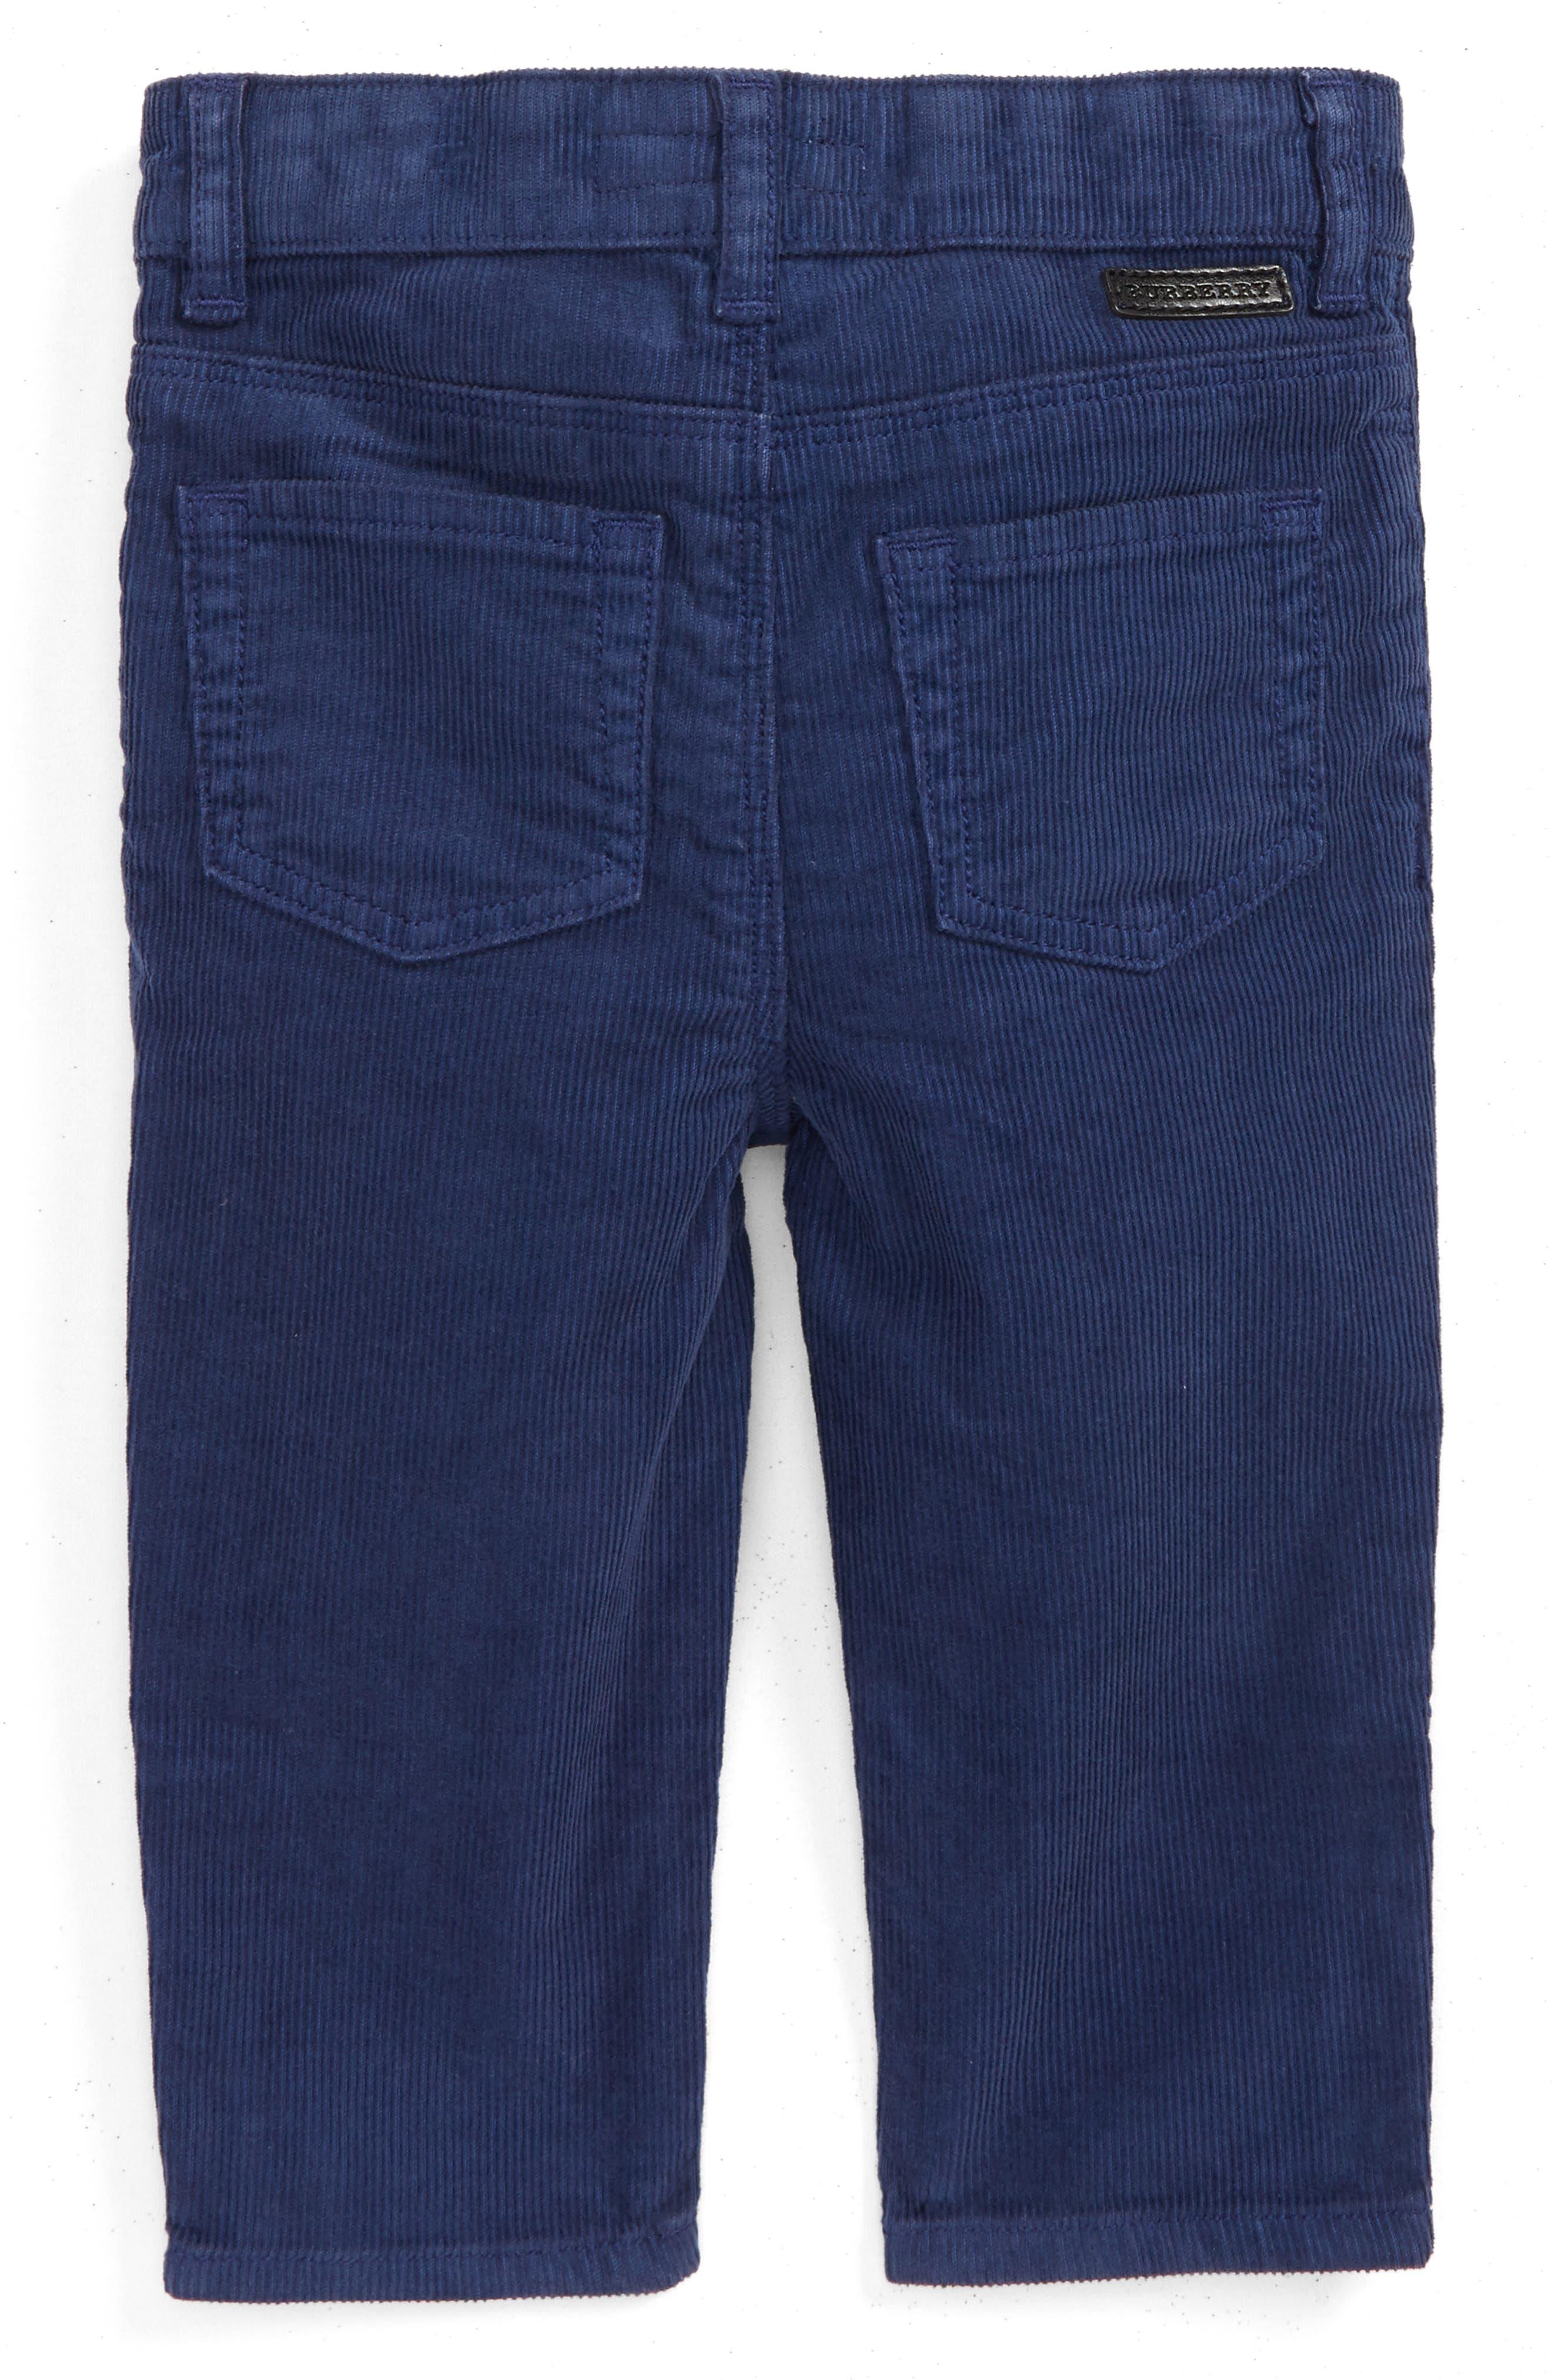 Langston Corduroy Skinny Pants,                             Alternate thumbnail 2, color,                             Blue